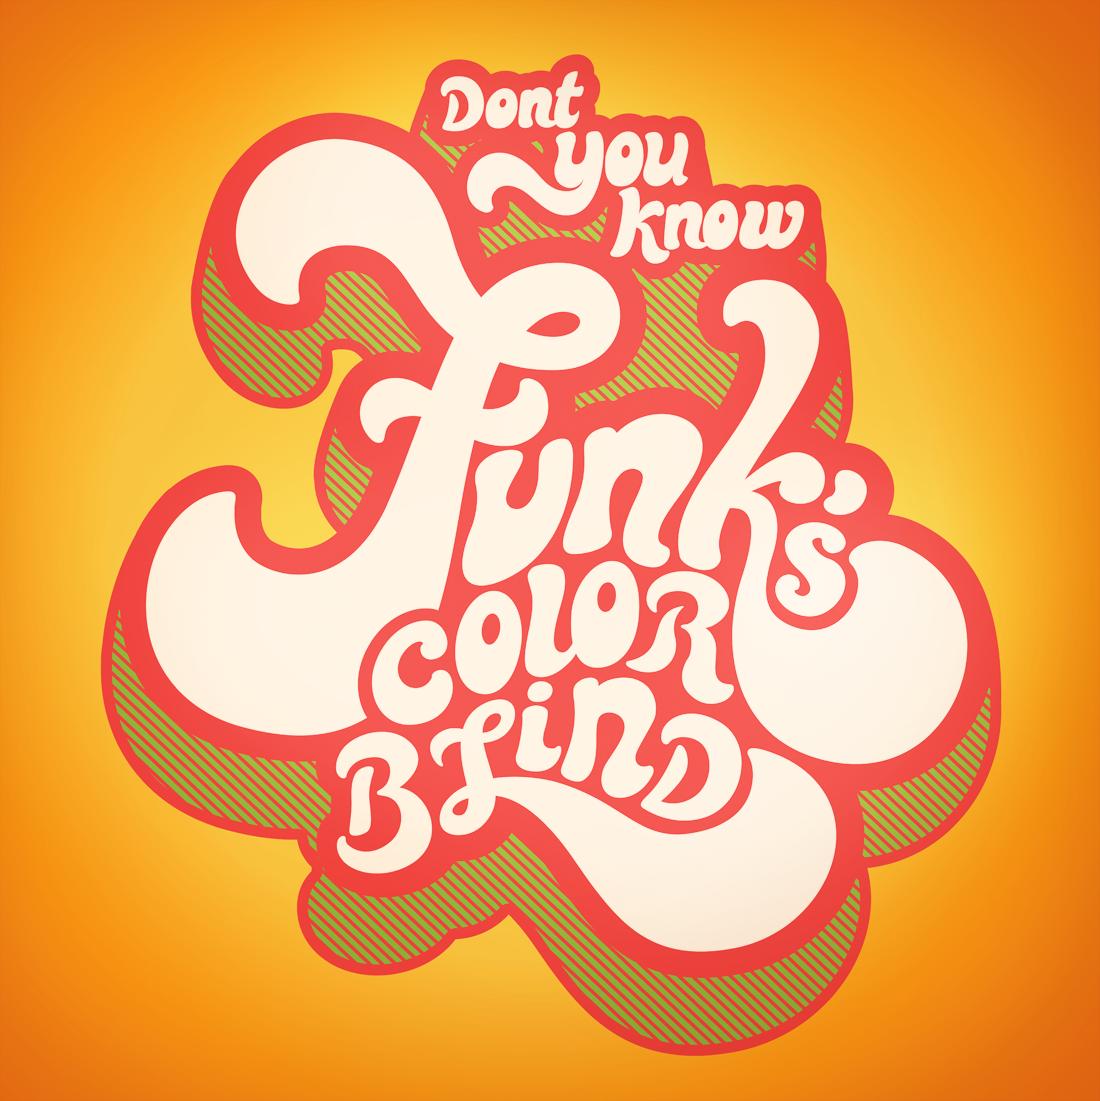 70s poster design - Funky Poster Vinyl Jaine Kopala Graphic Design